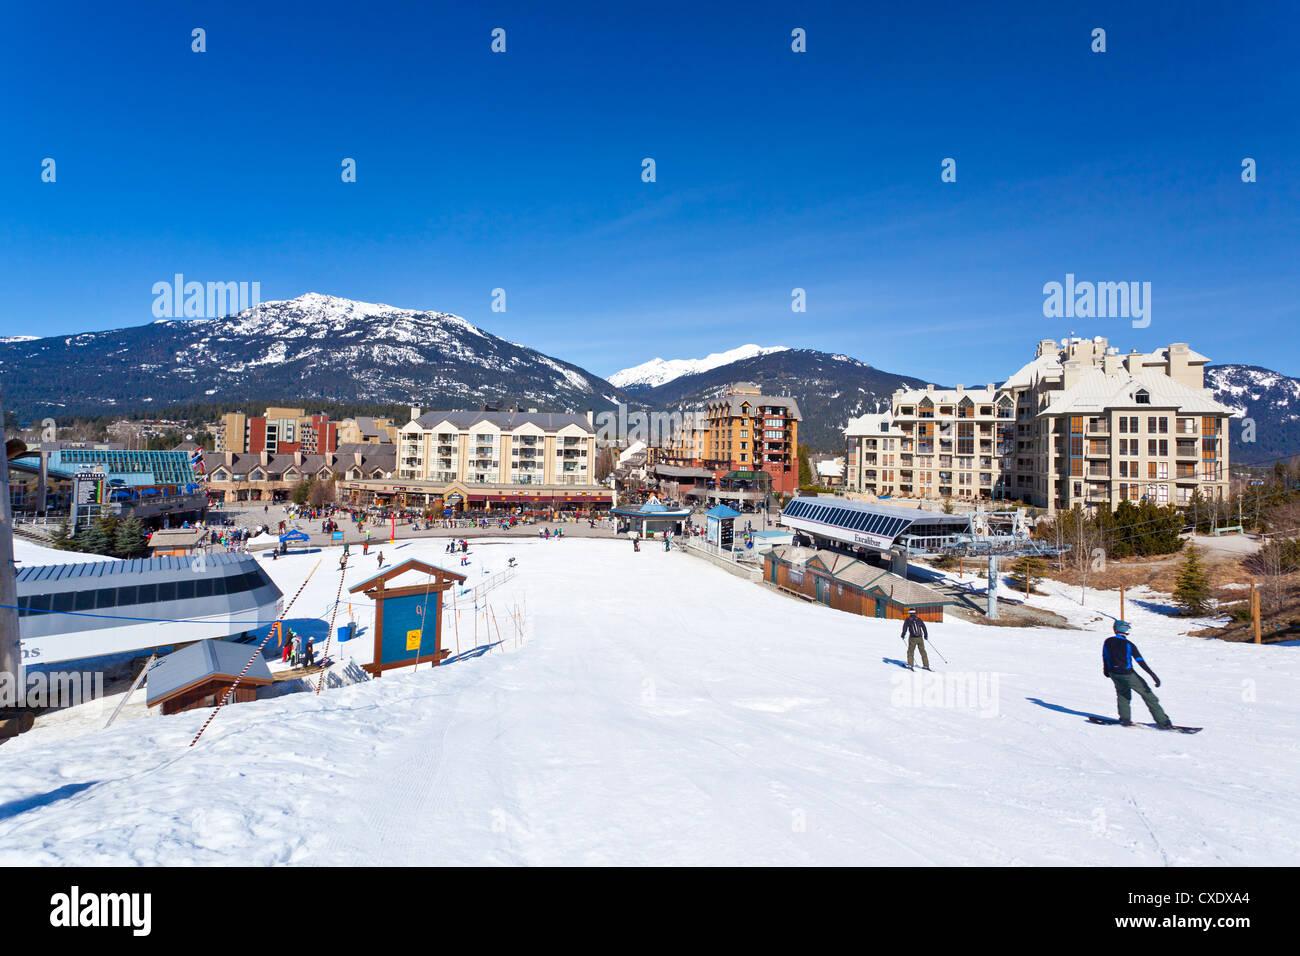 Whistler Blackcomb Ski Resort, Whistler, British Columbia, Canada, North America Stock Photo